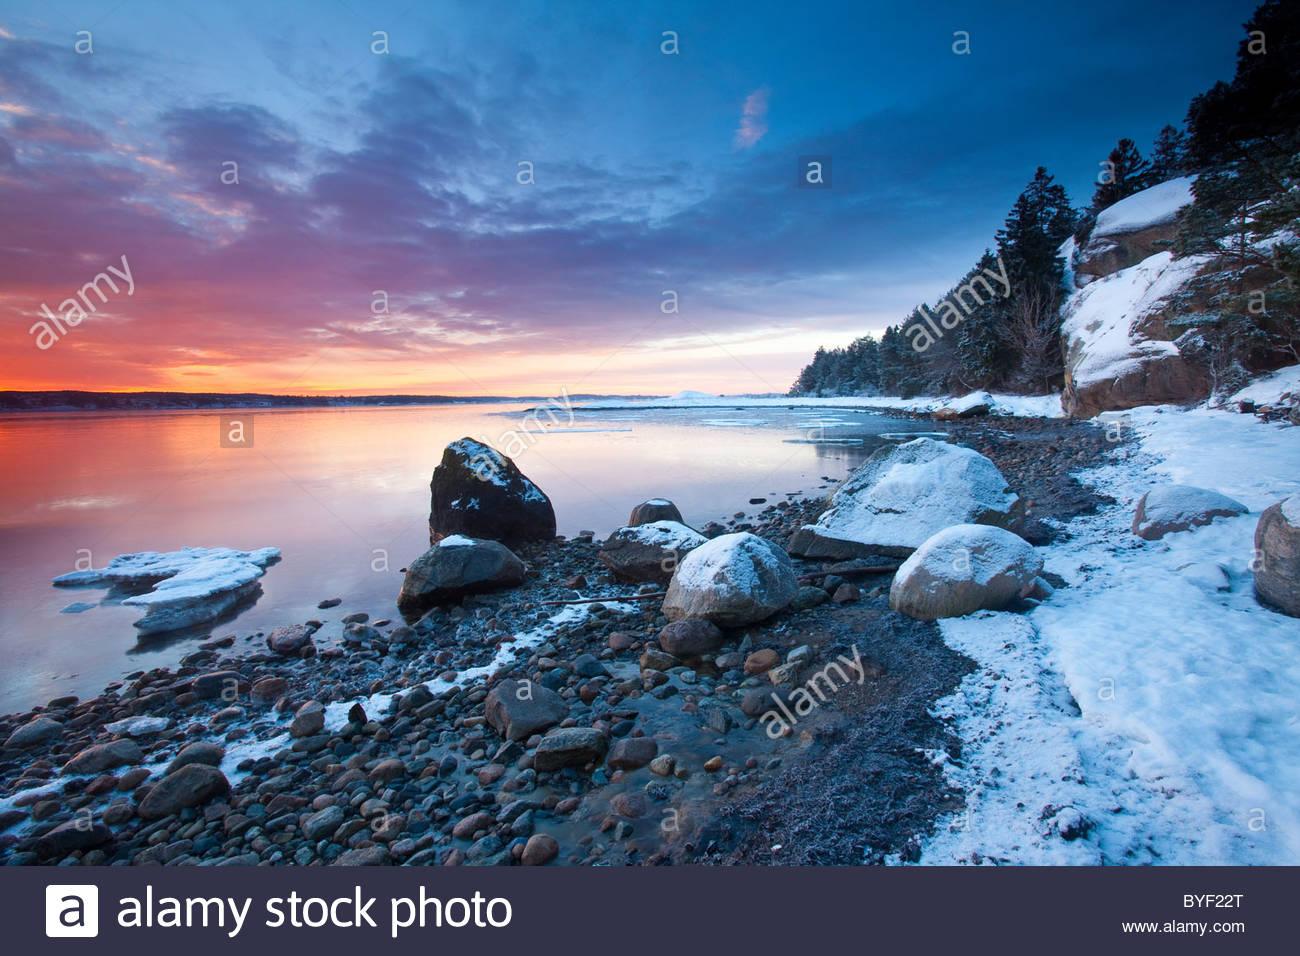 Super winter Sonnenaufgang durch den Oslofjord am Ofen in Råde, Østfold fylke, südöstliche Norwegen. Stockbild